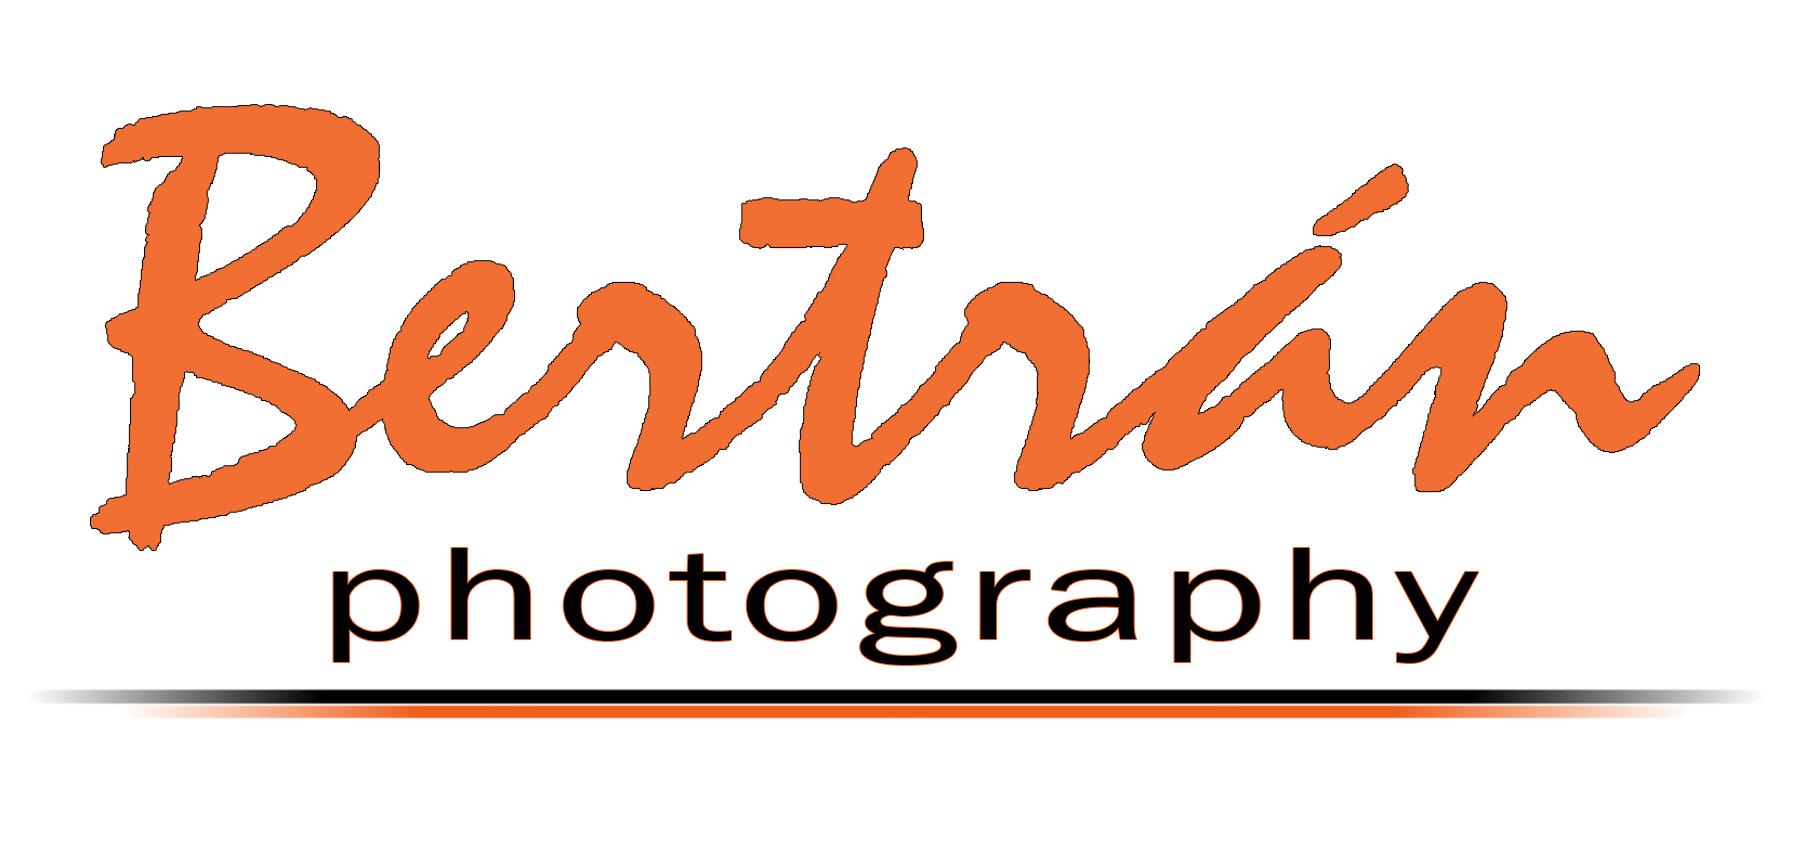 Bertran Photography logo